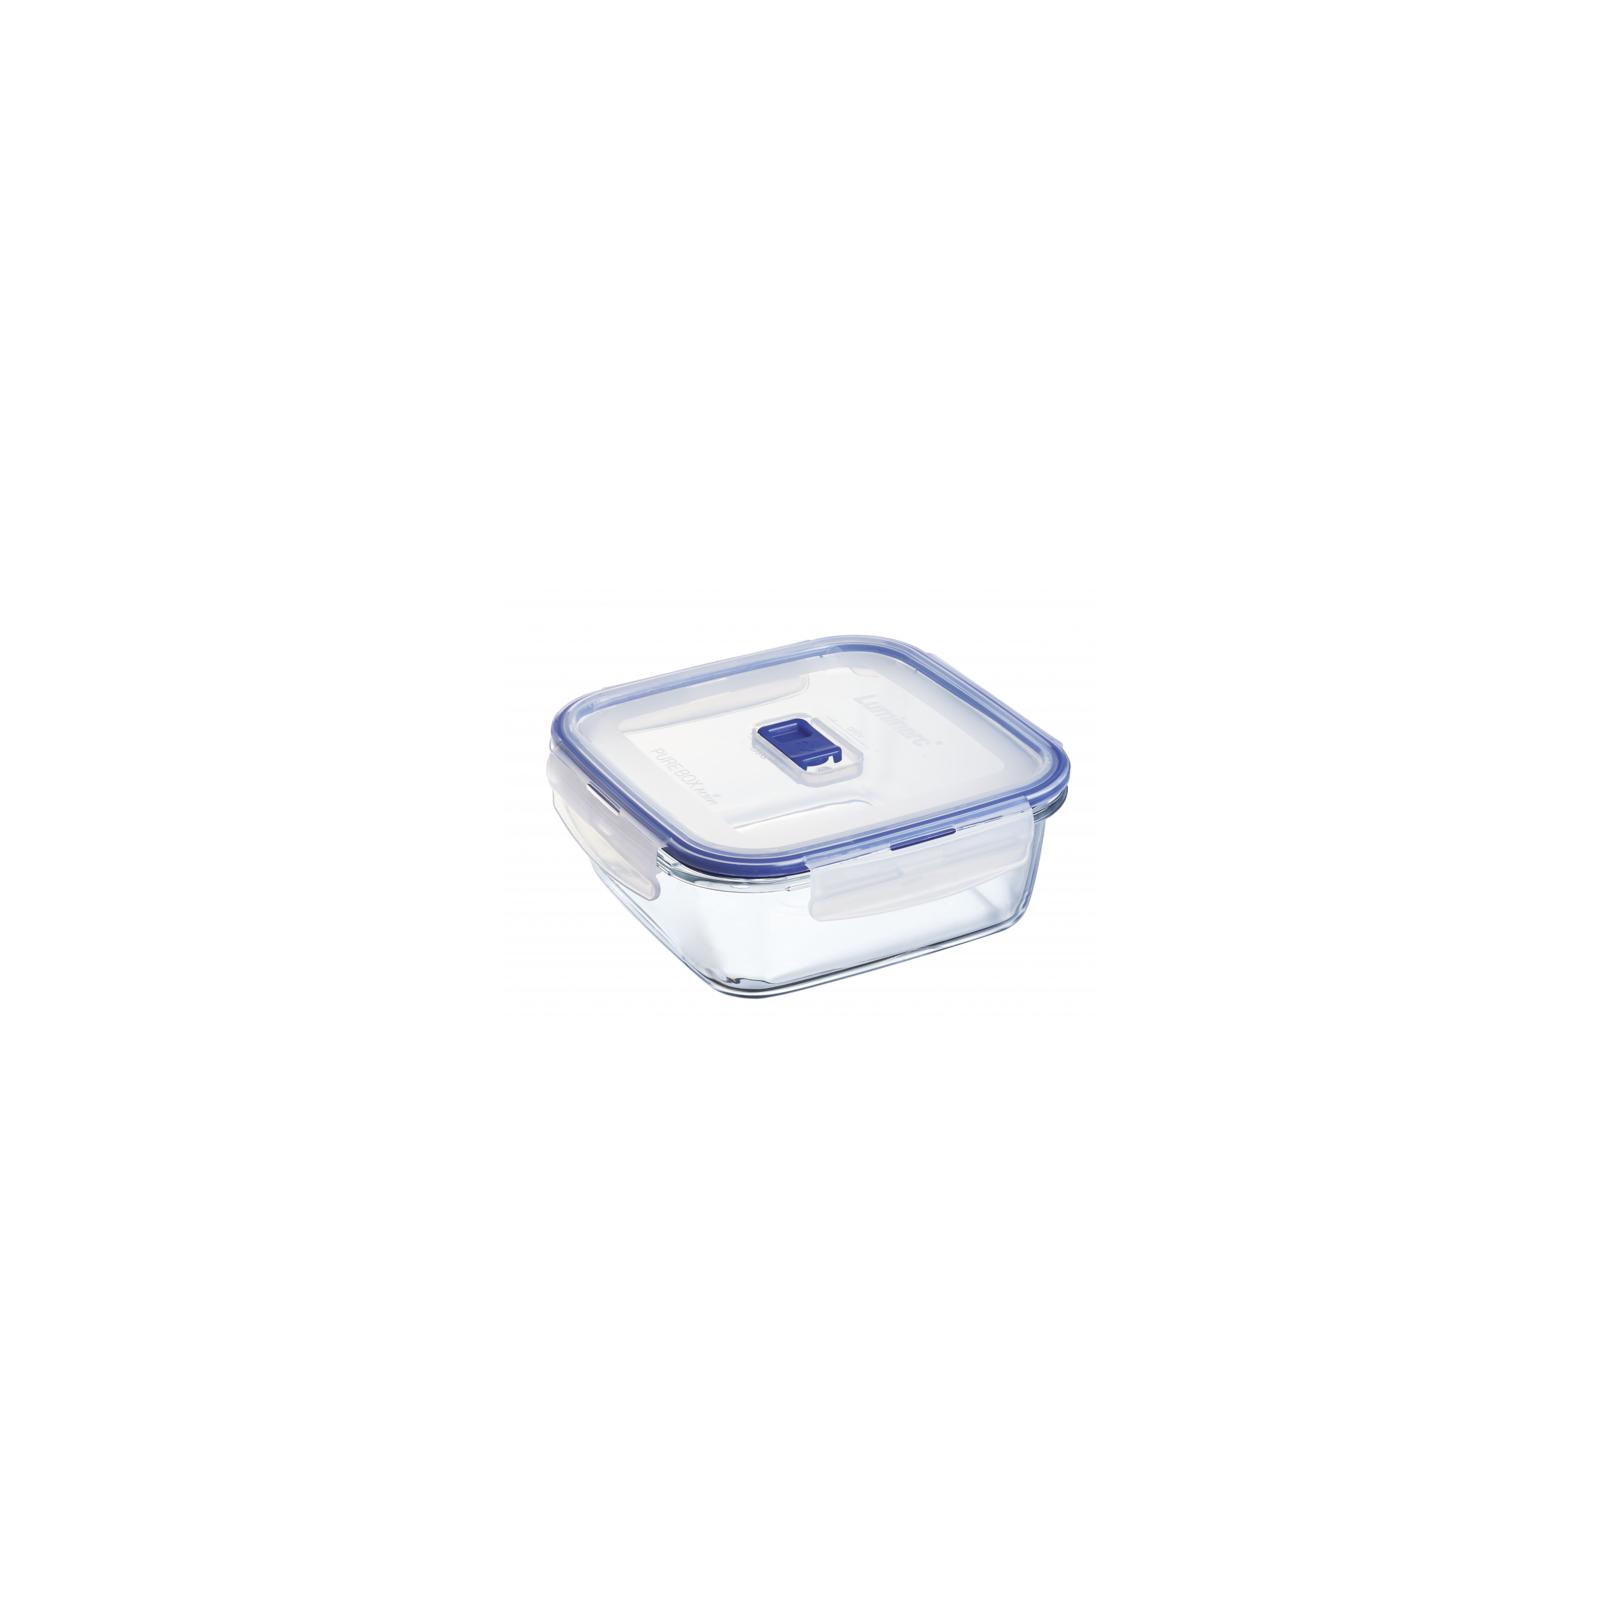 Пищевой контейнер Luminarc Pure Box Active набор 3шт квадр. 380мл/770мл/1220мл (P5276) изображение 3